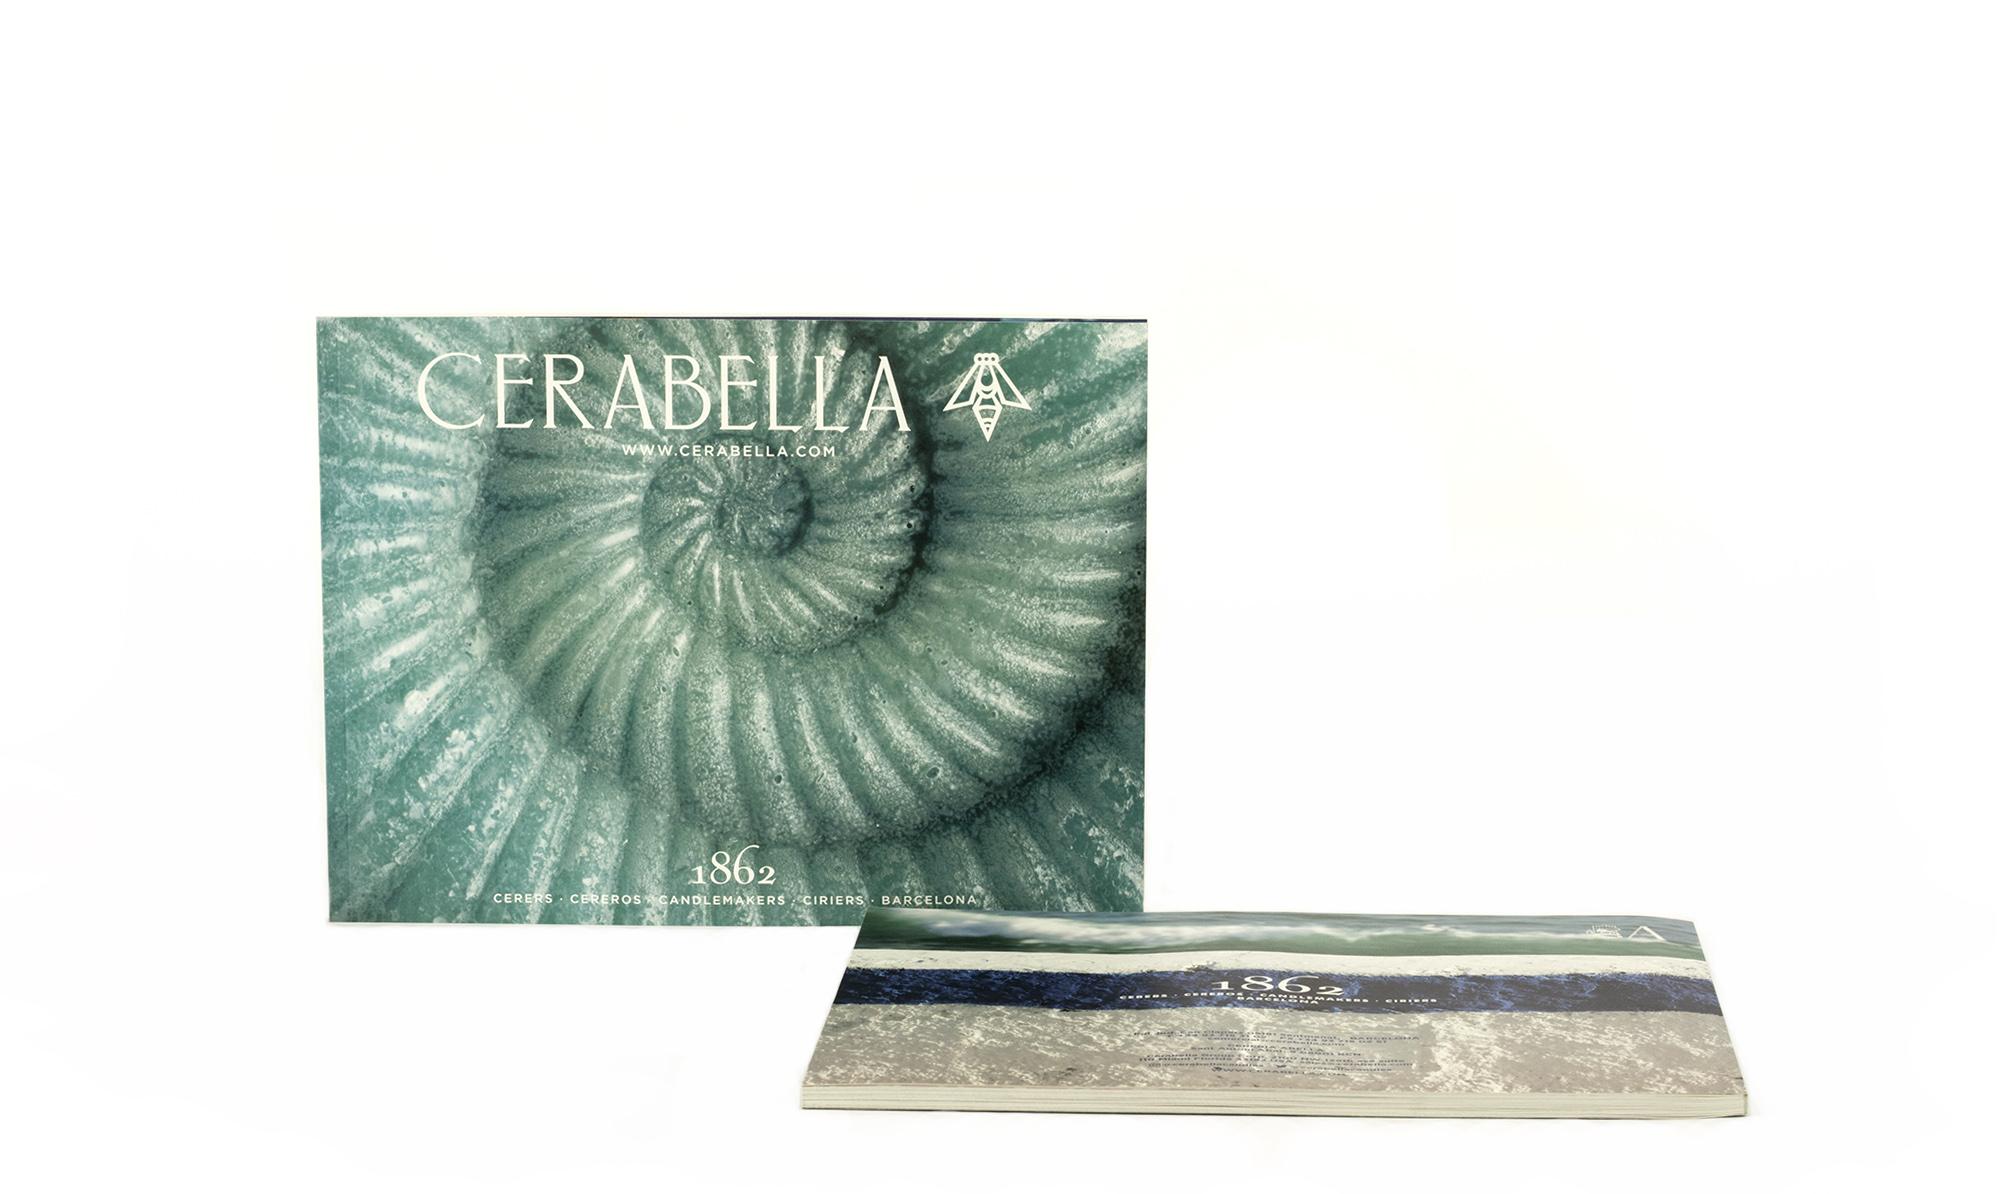 Catálogo Cerabella